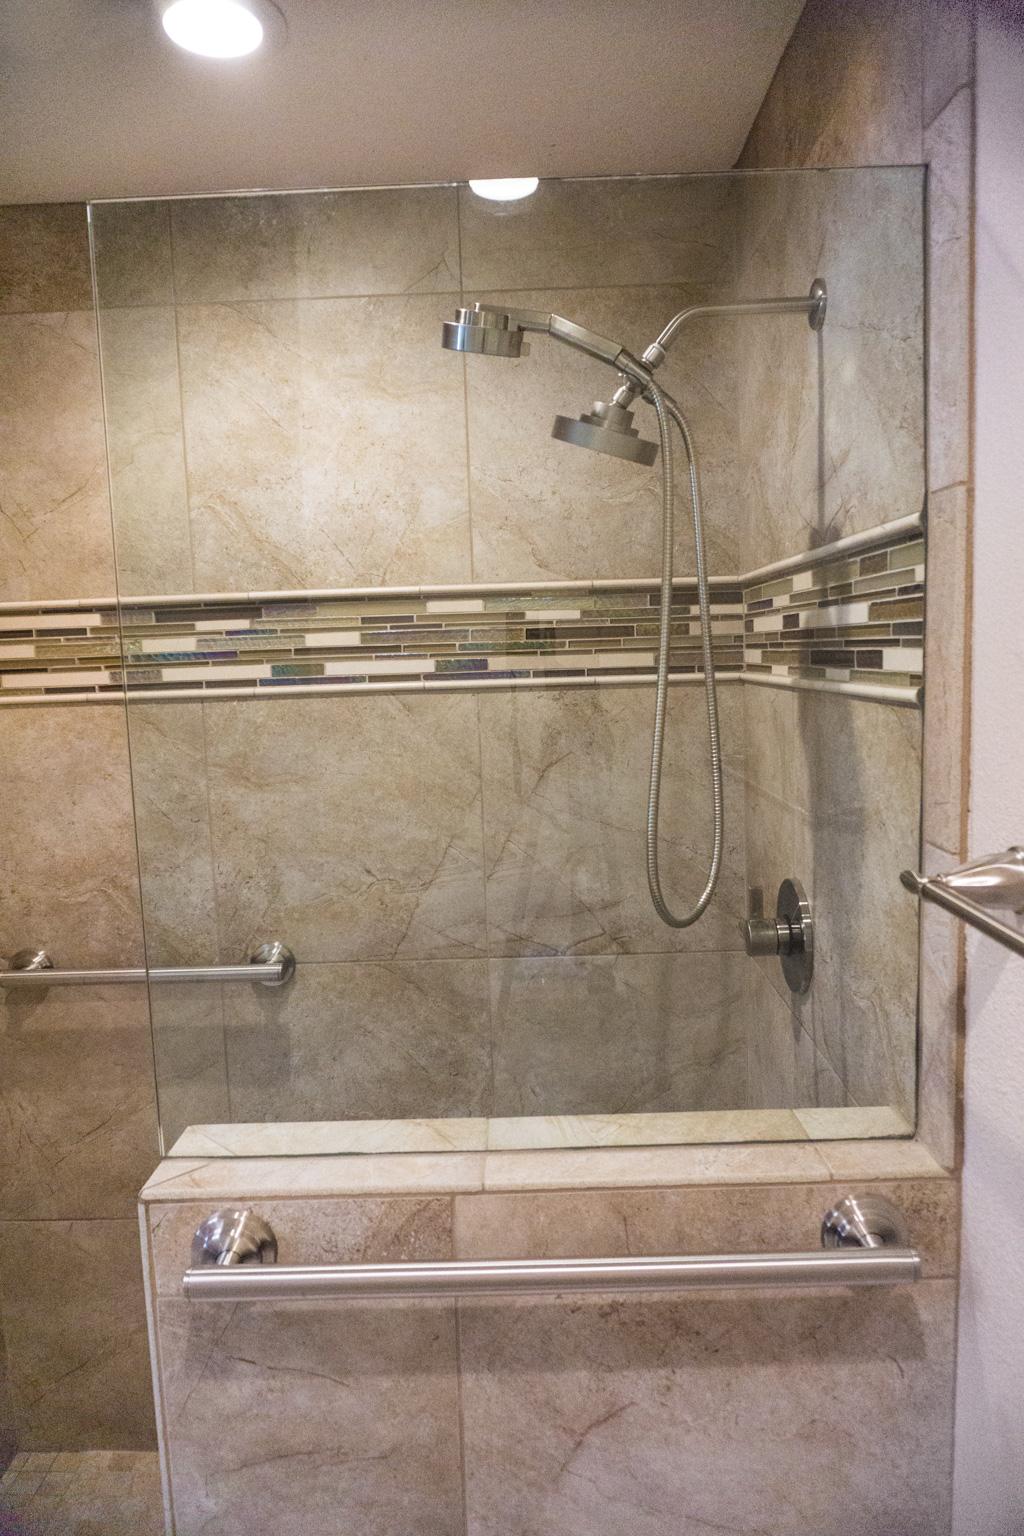 Condo Modern Kitchen Amp Baths Remodel Danilo Nesovic